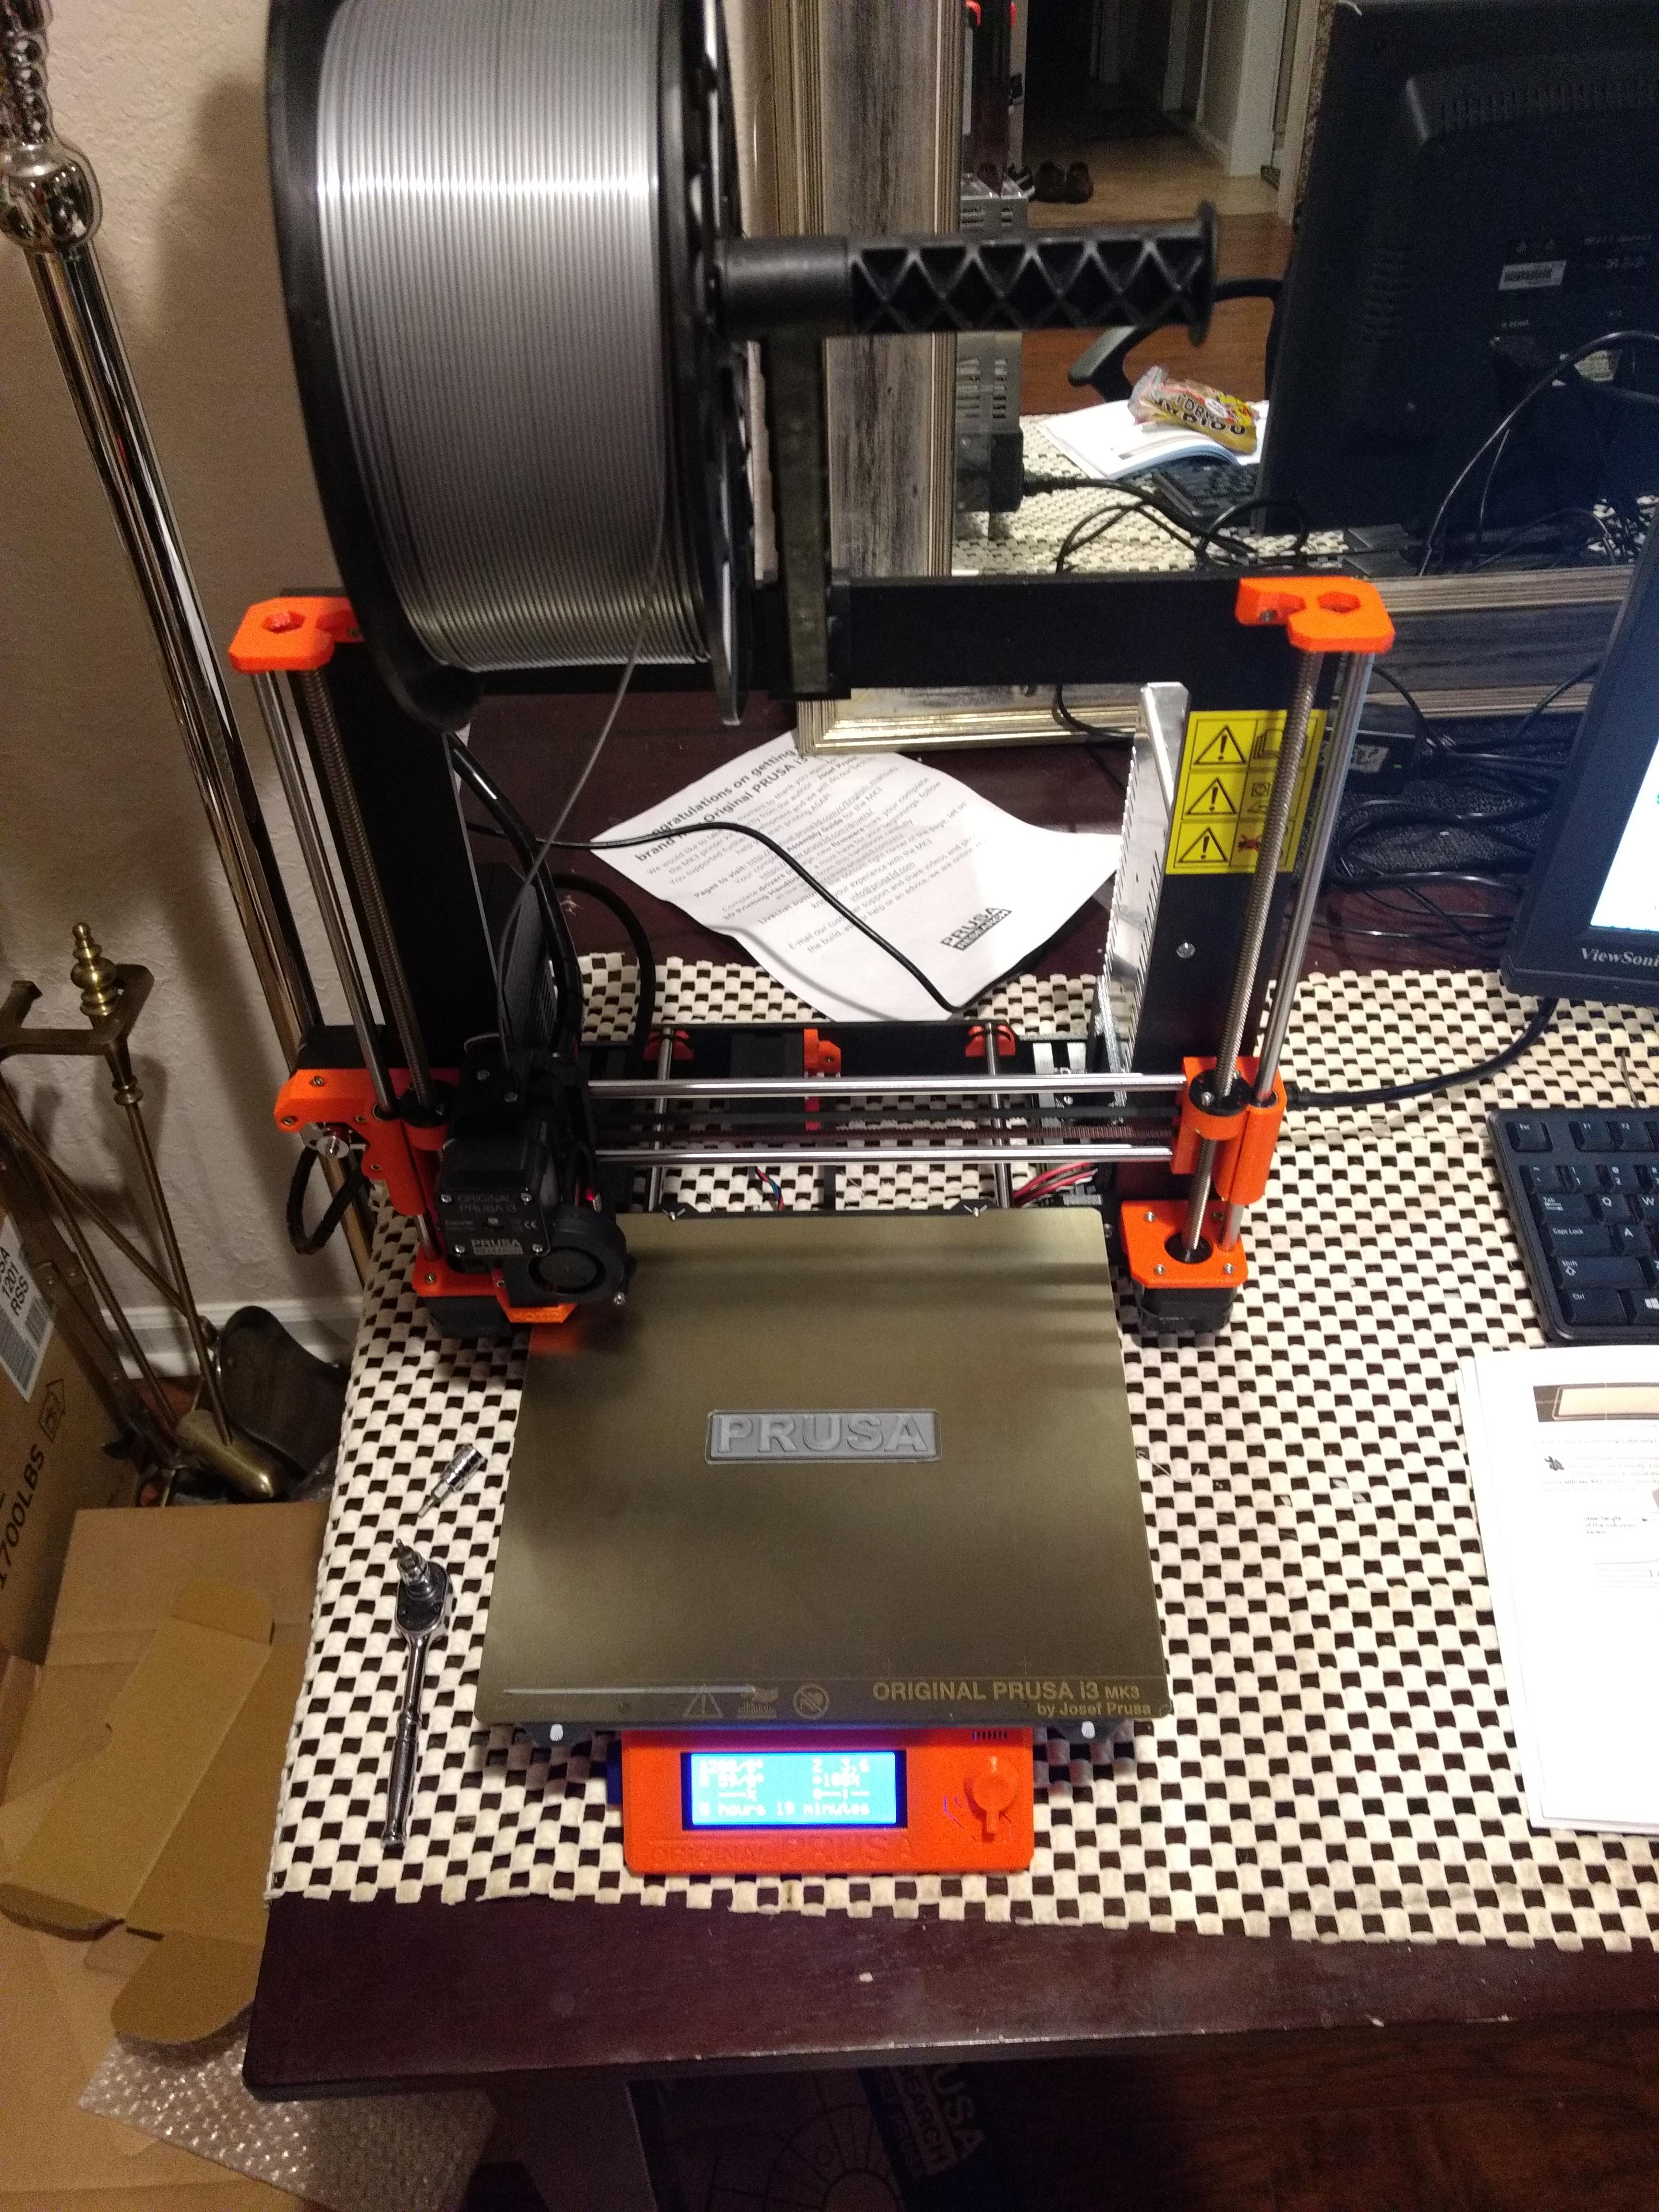 lib reviews - Reviews by Team: 3D Printing